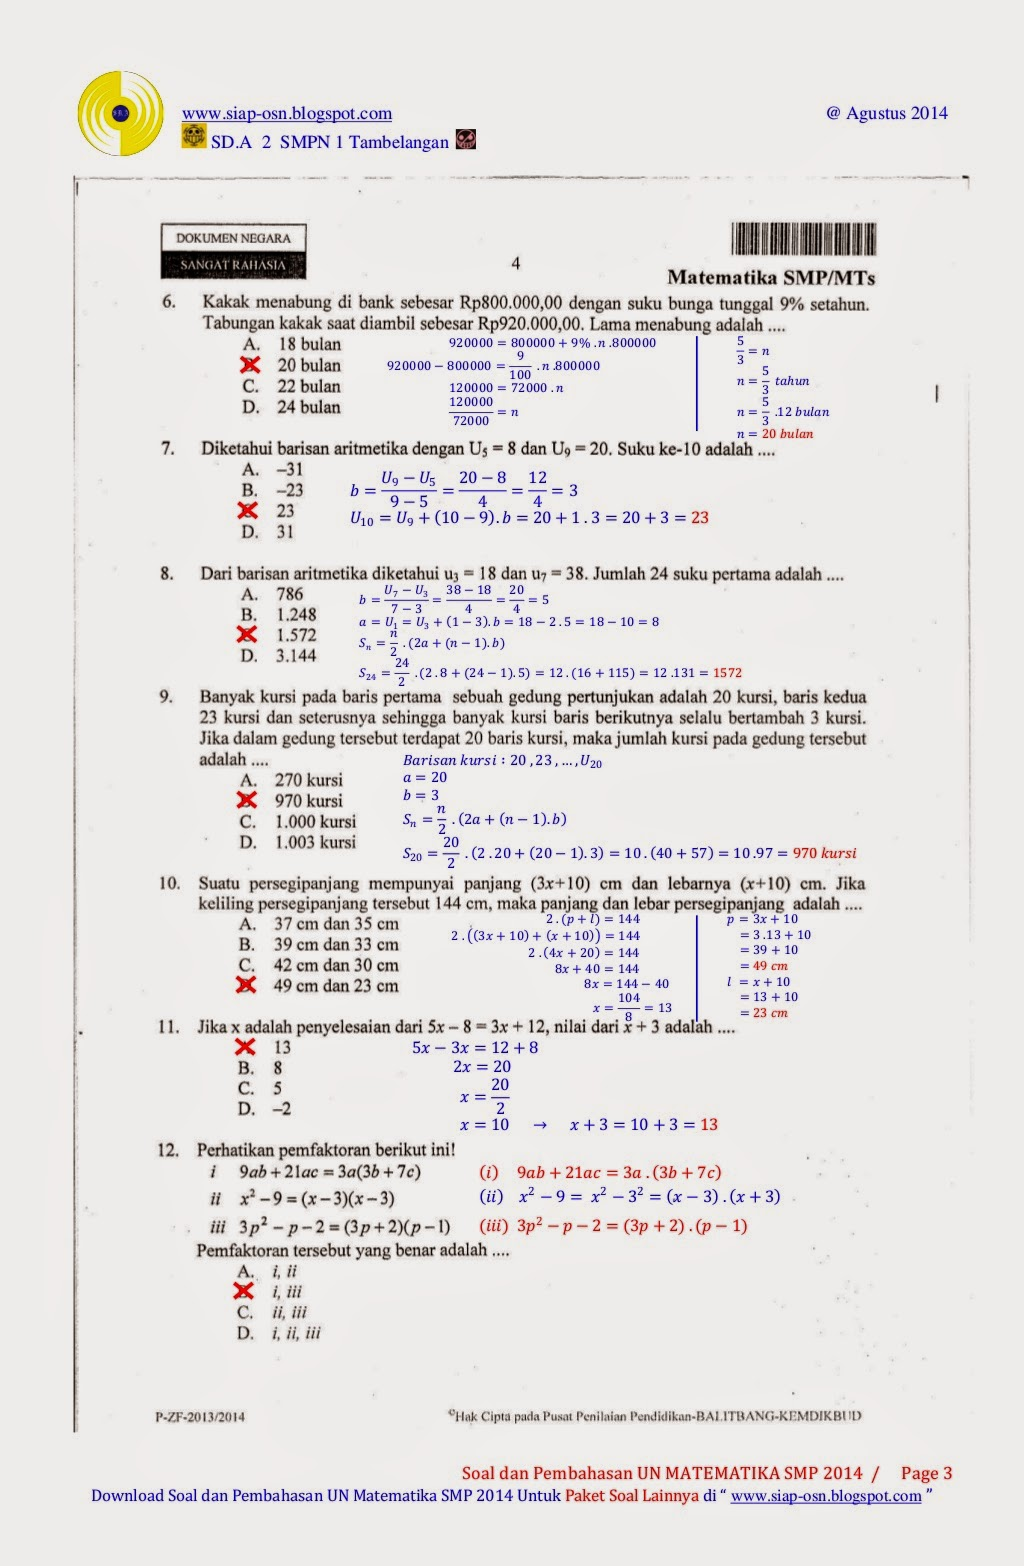 Contoh Soal Matematika Di Korea Selatan Mata Pelajaran